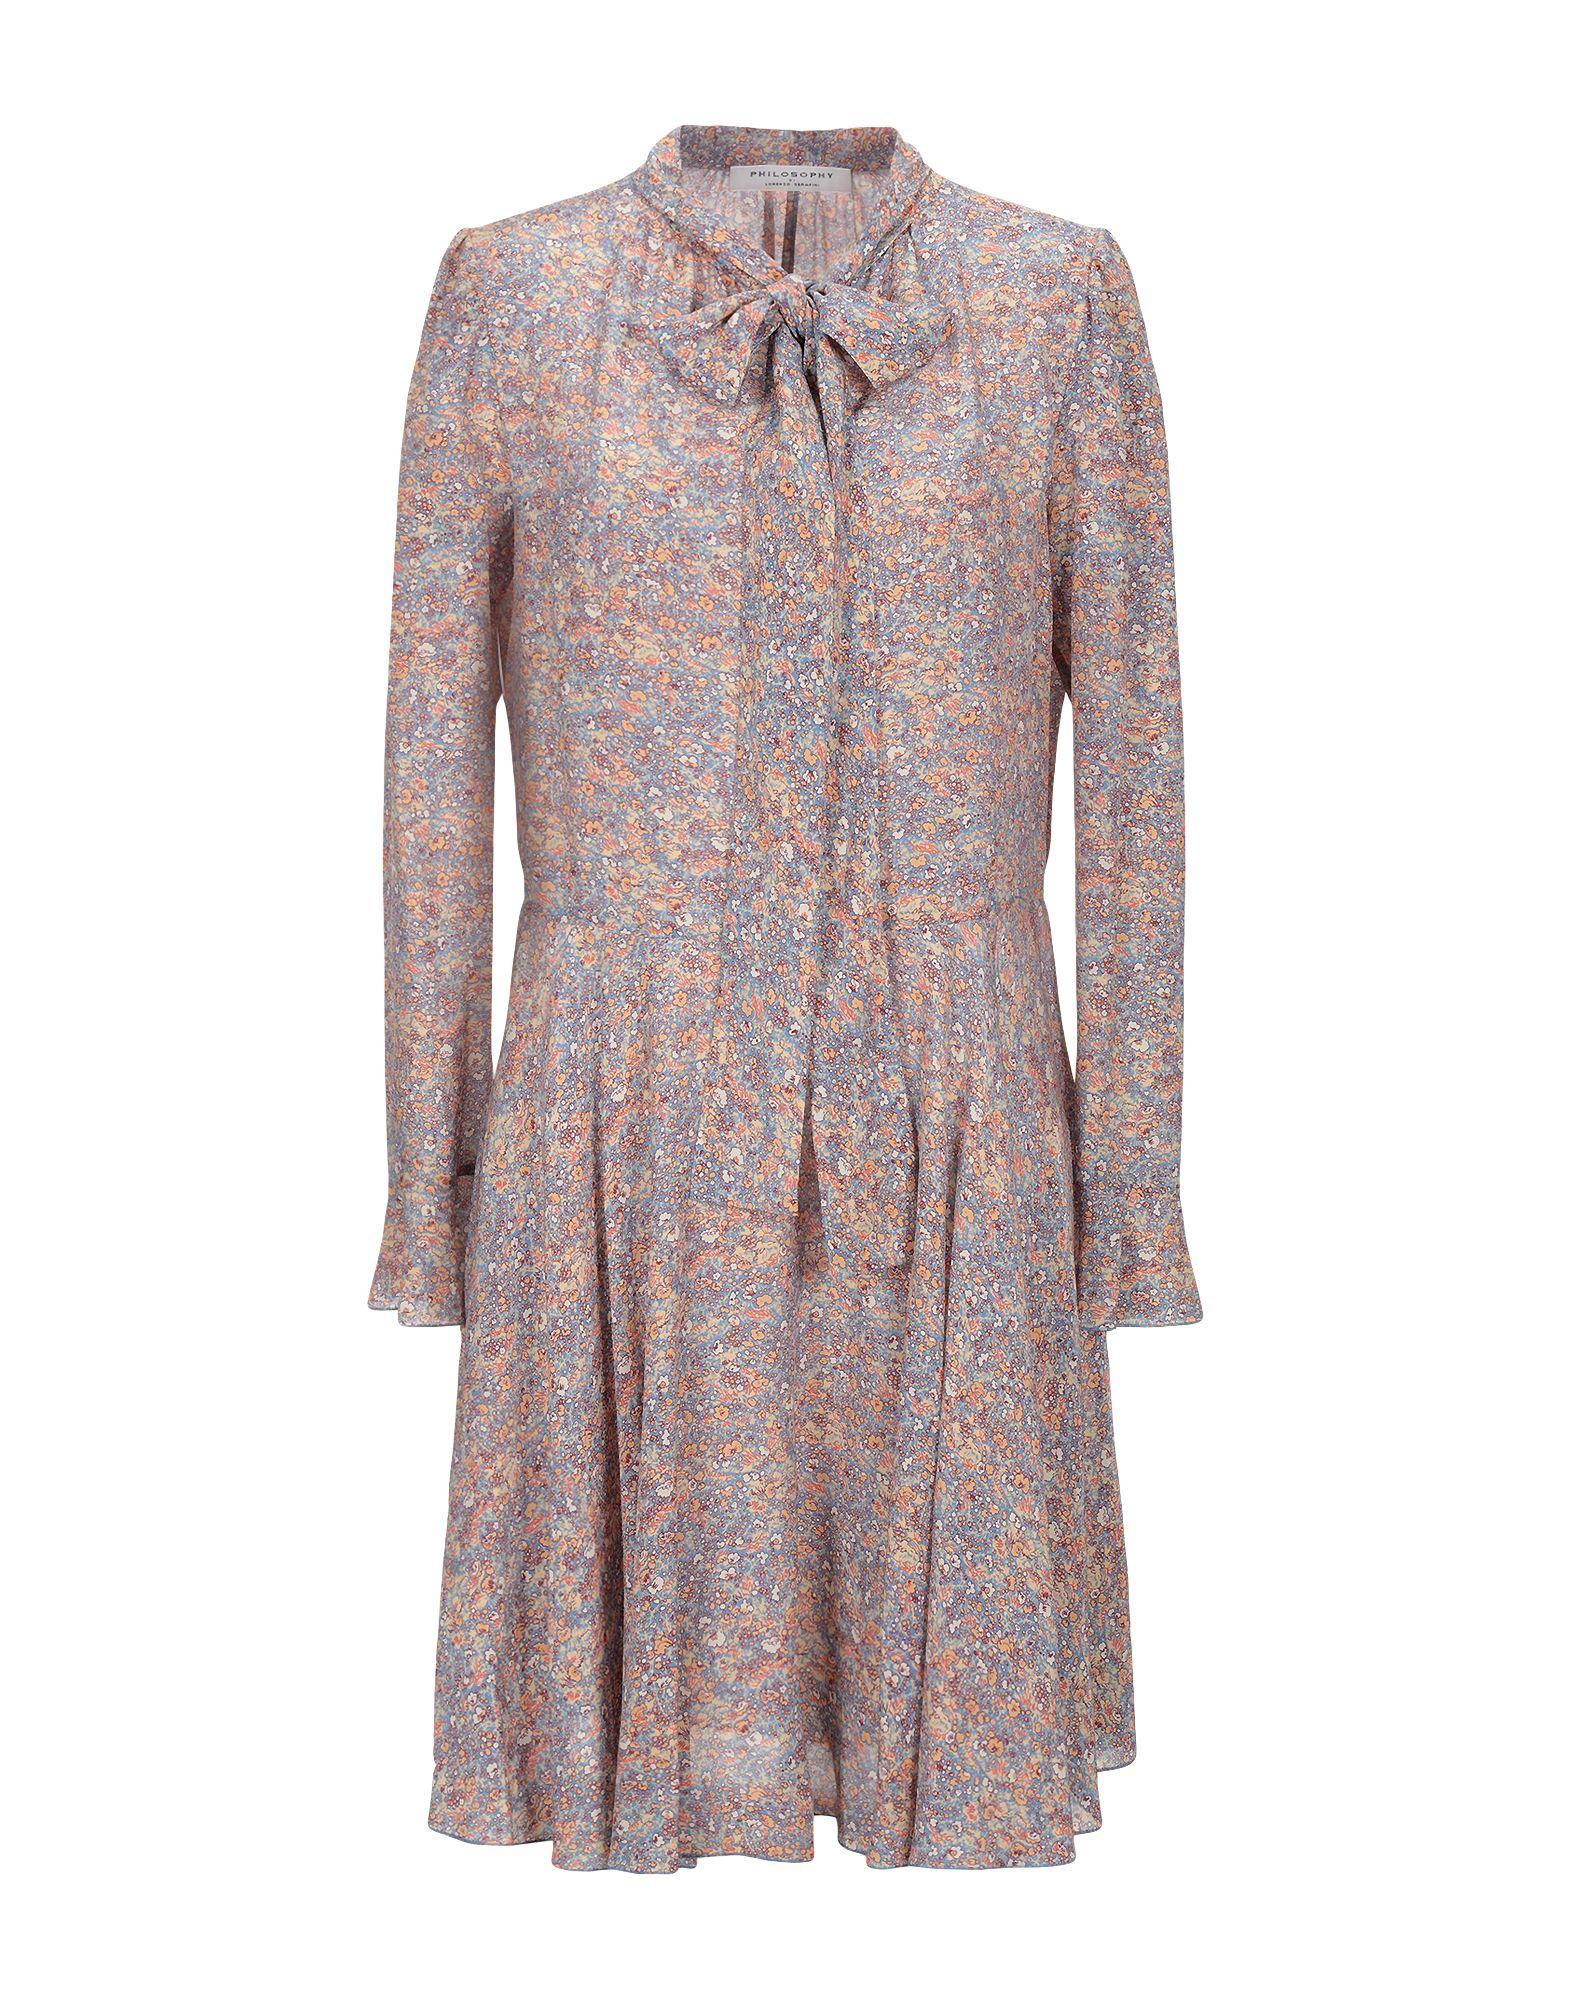 PHILOSOPHY di LORENZO SERAFINI Короткое платье все цены